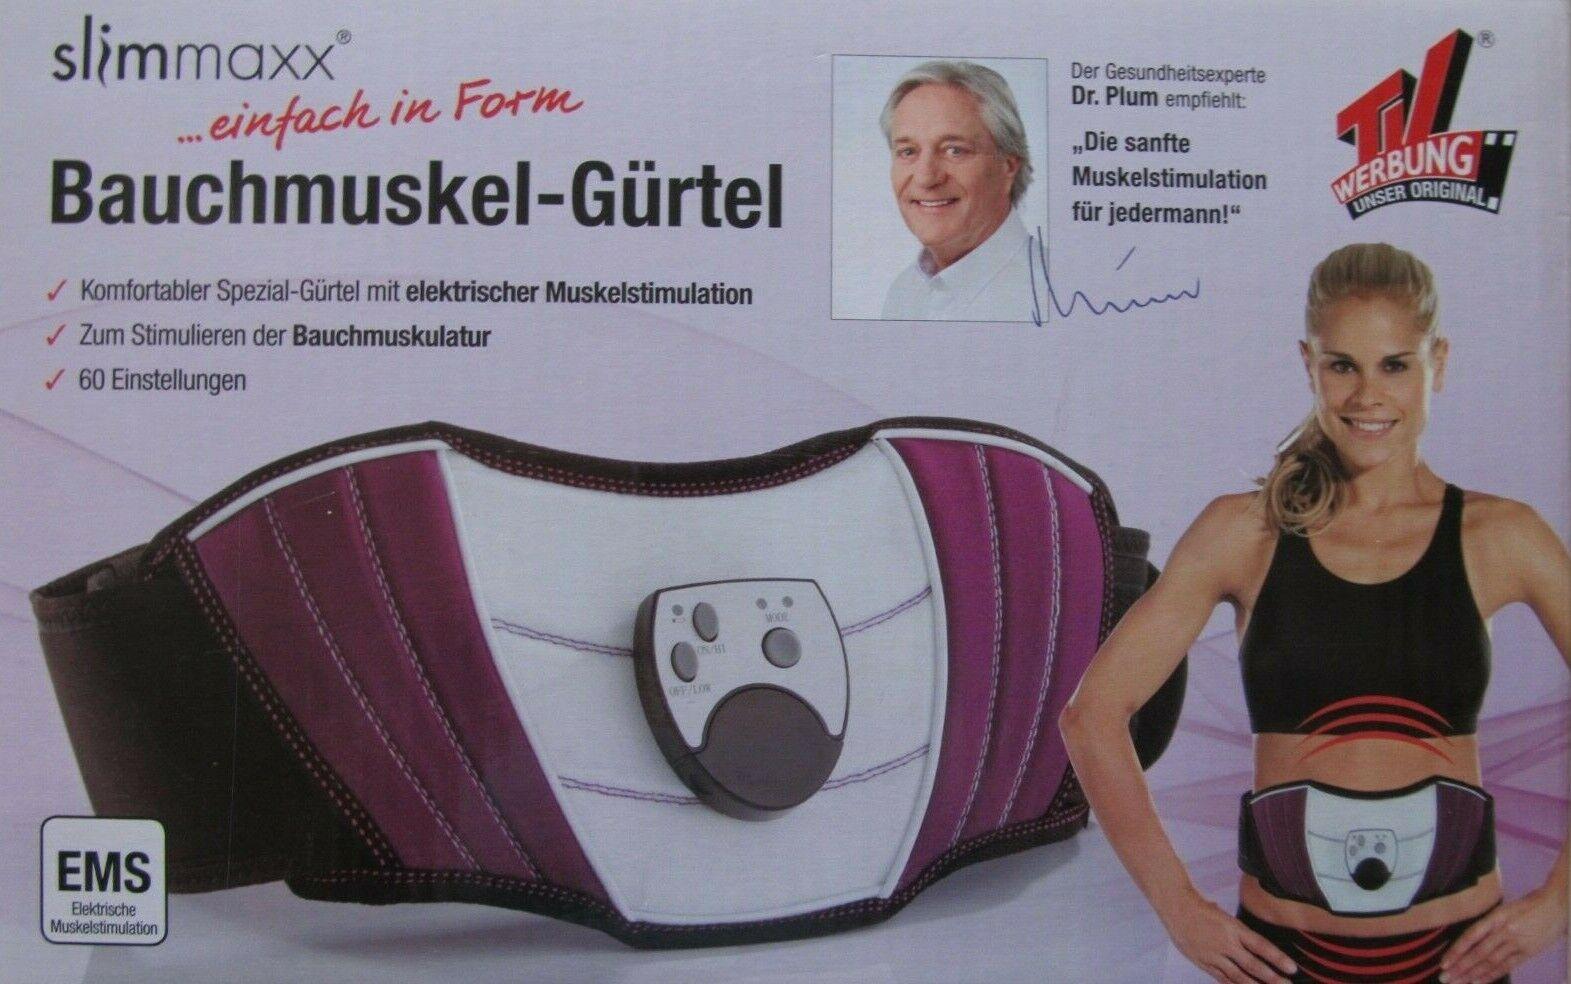 slimmaxx Bauchmuskel-Gürtel mit Kontaktgel NEU